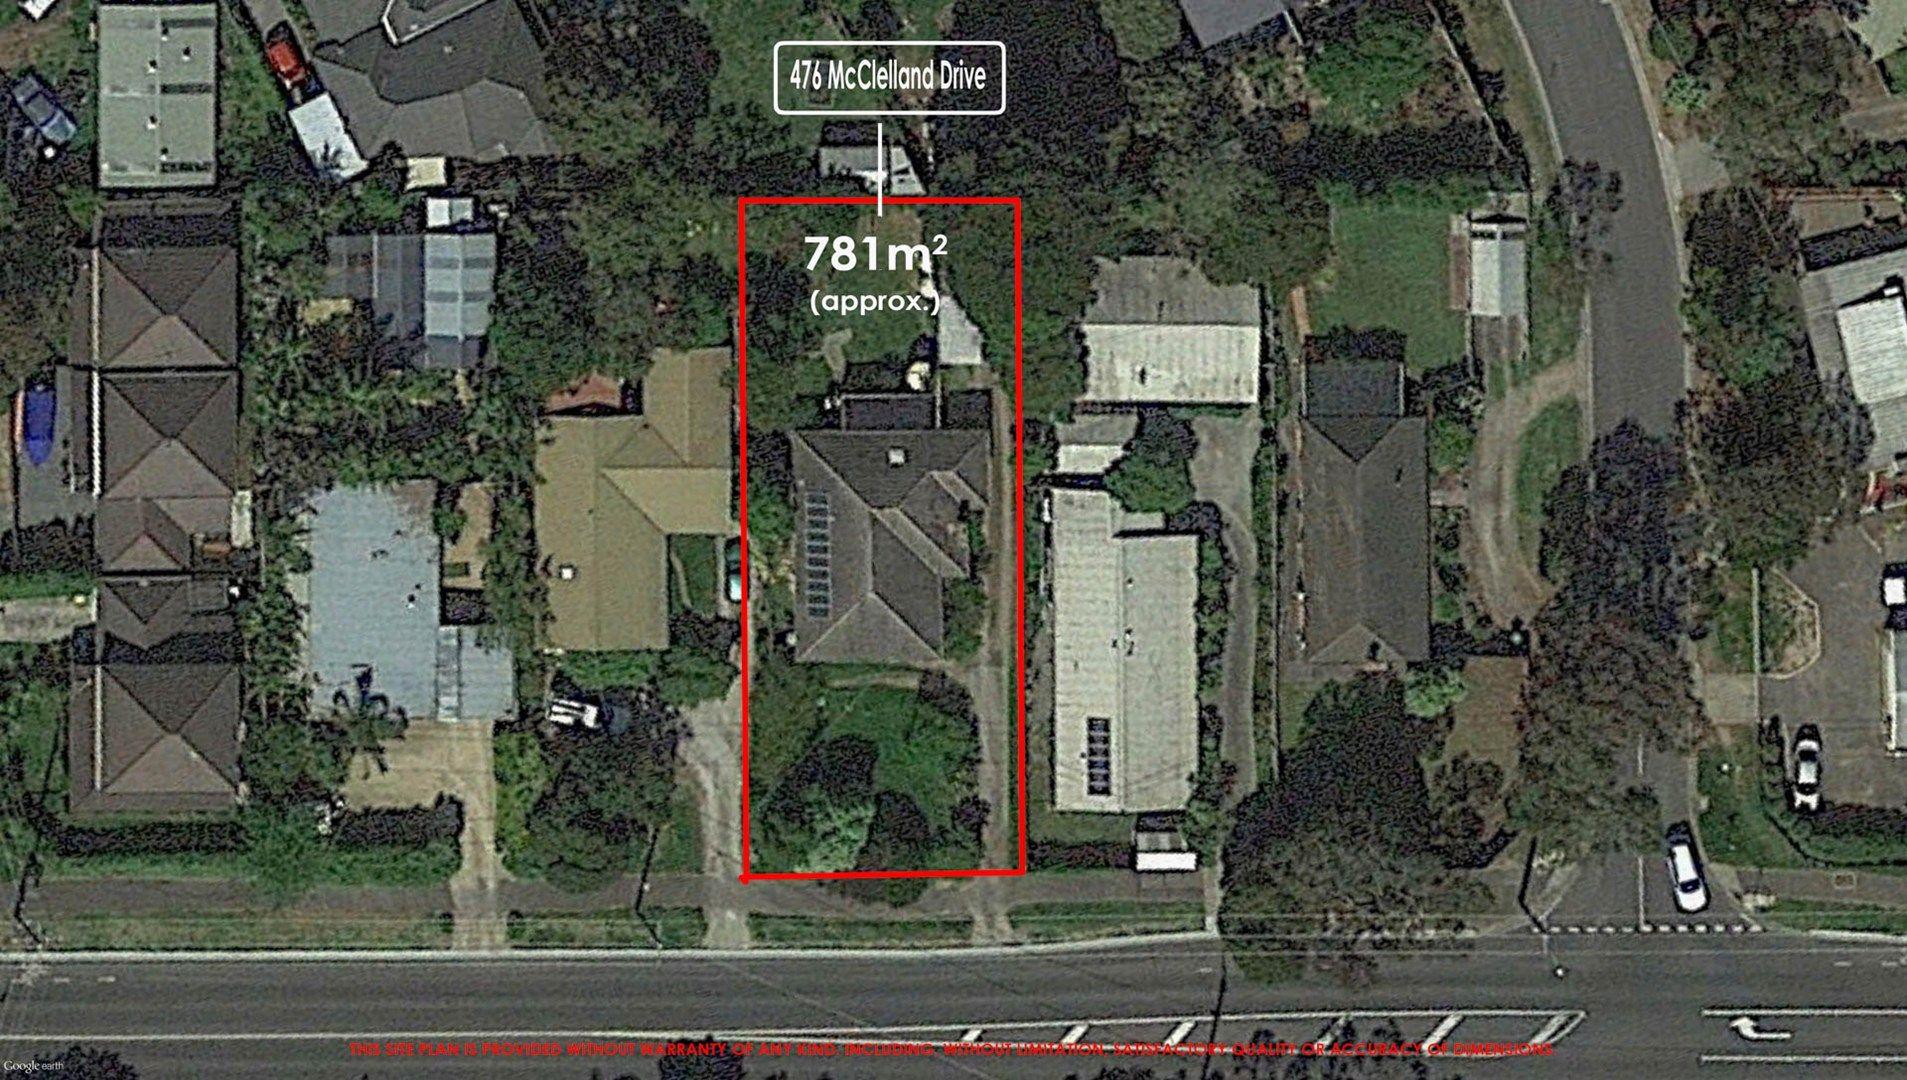 476 McClelland Drive, Langwarrin VIC 3910, Image 0